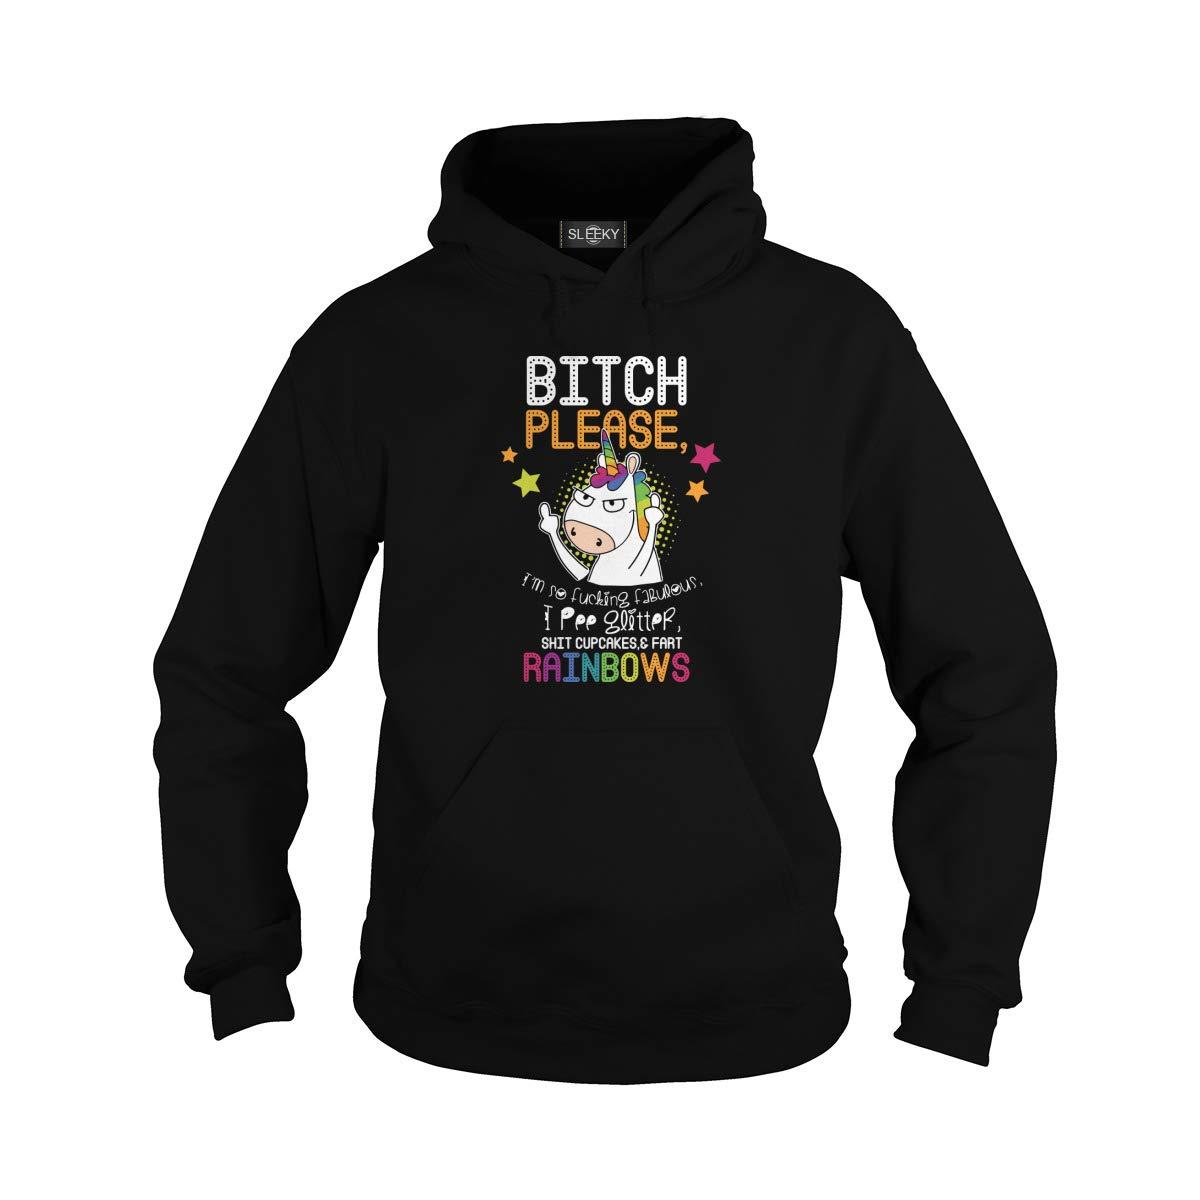 Bitch Please Im So F Fabulous Pee Glitter Shit Cupcakes Fart Rainbow Unicorn 6167 Shirts